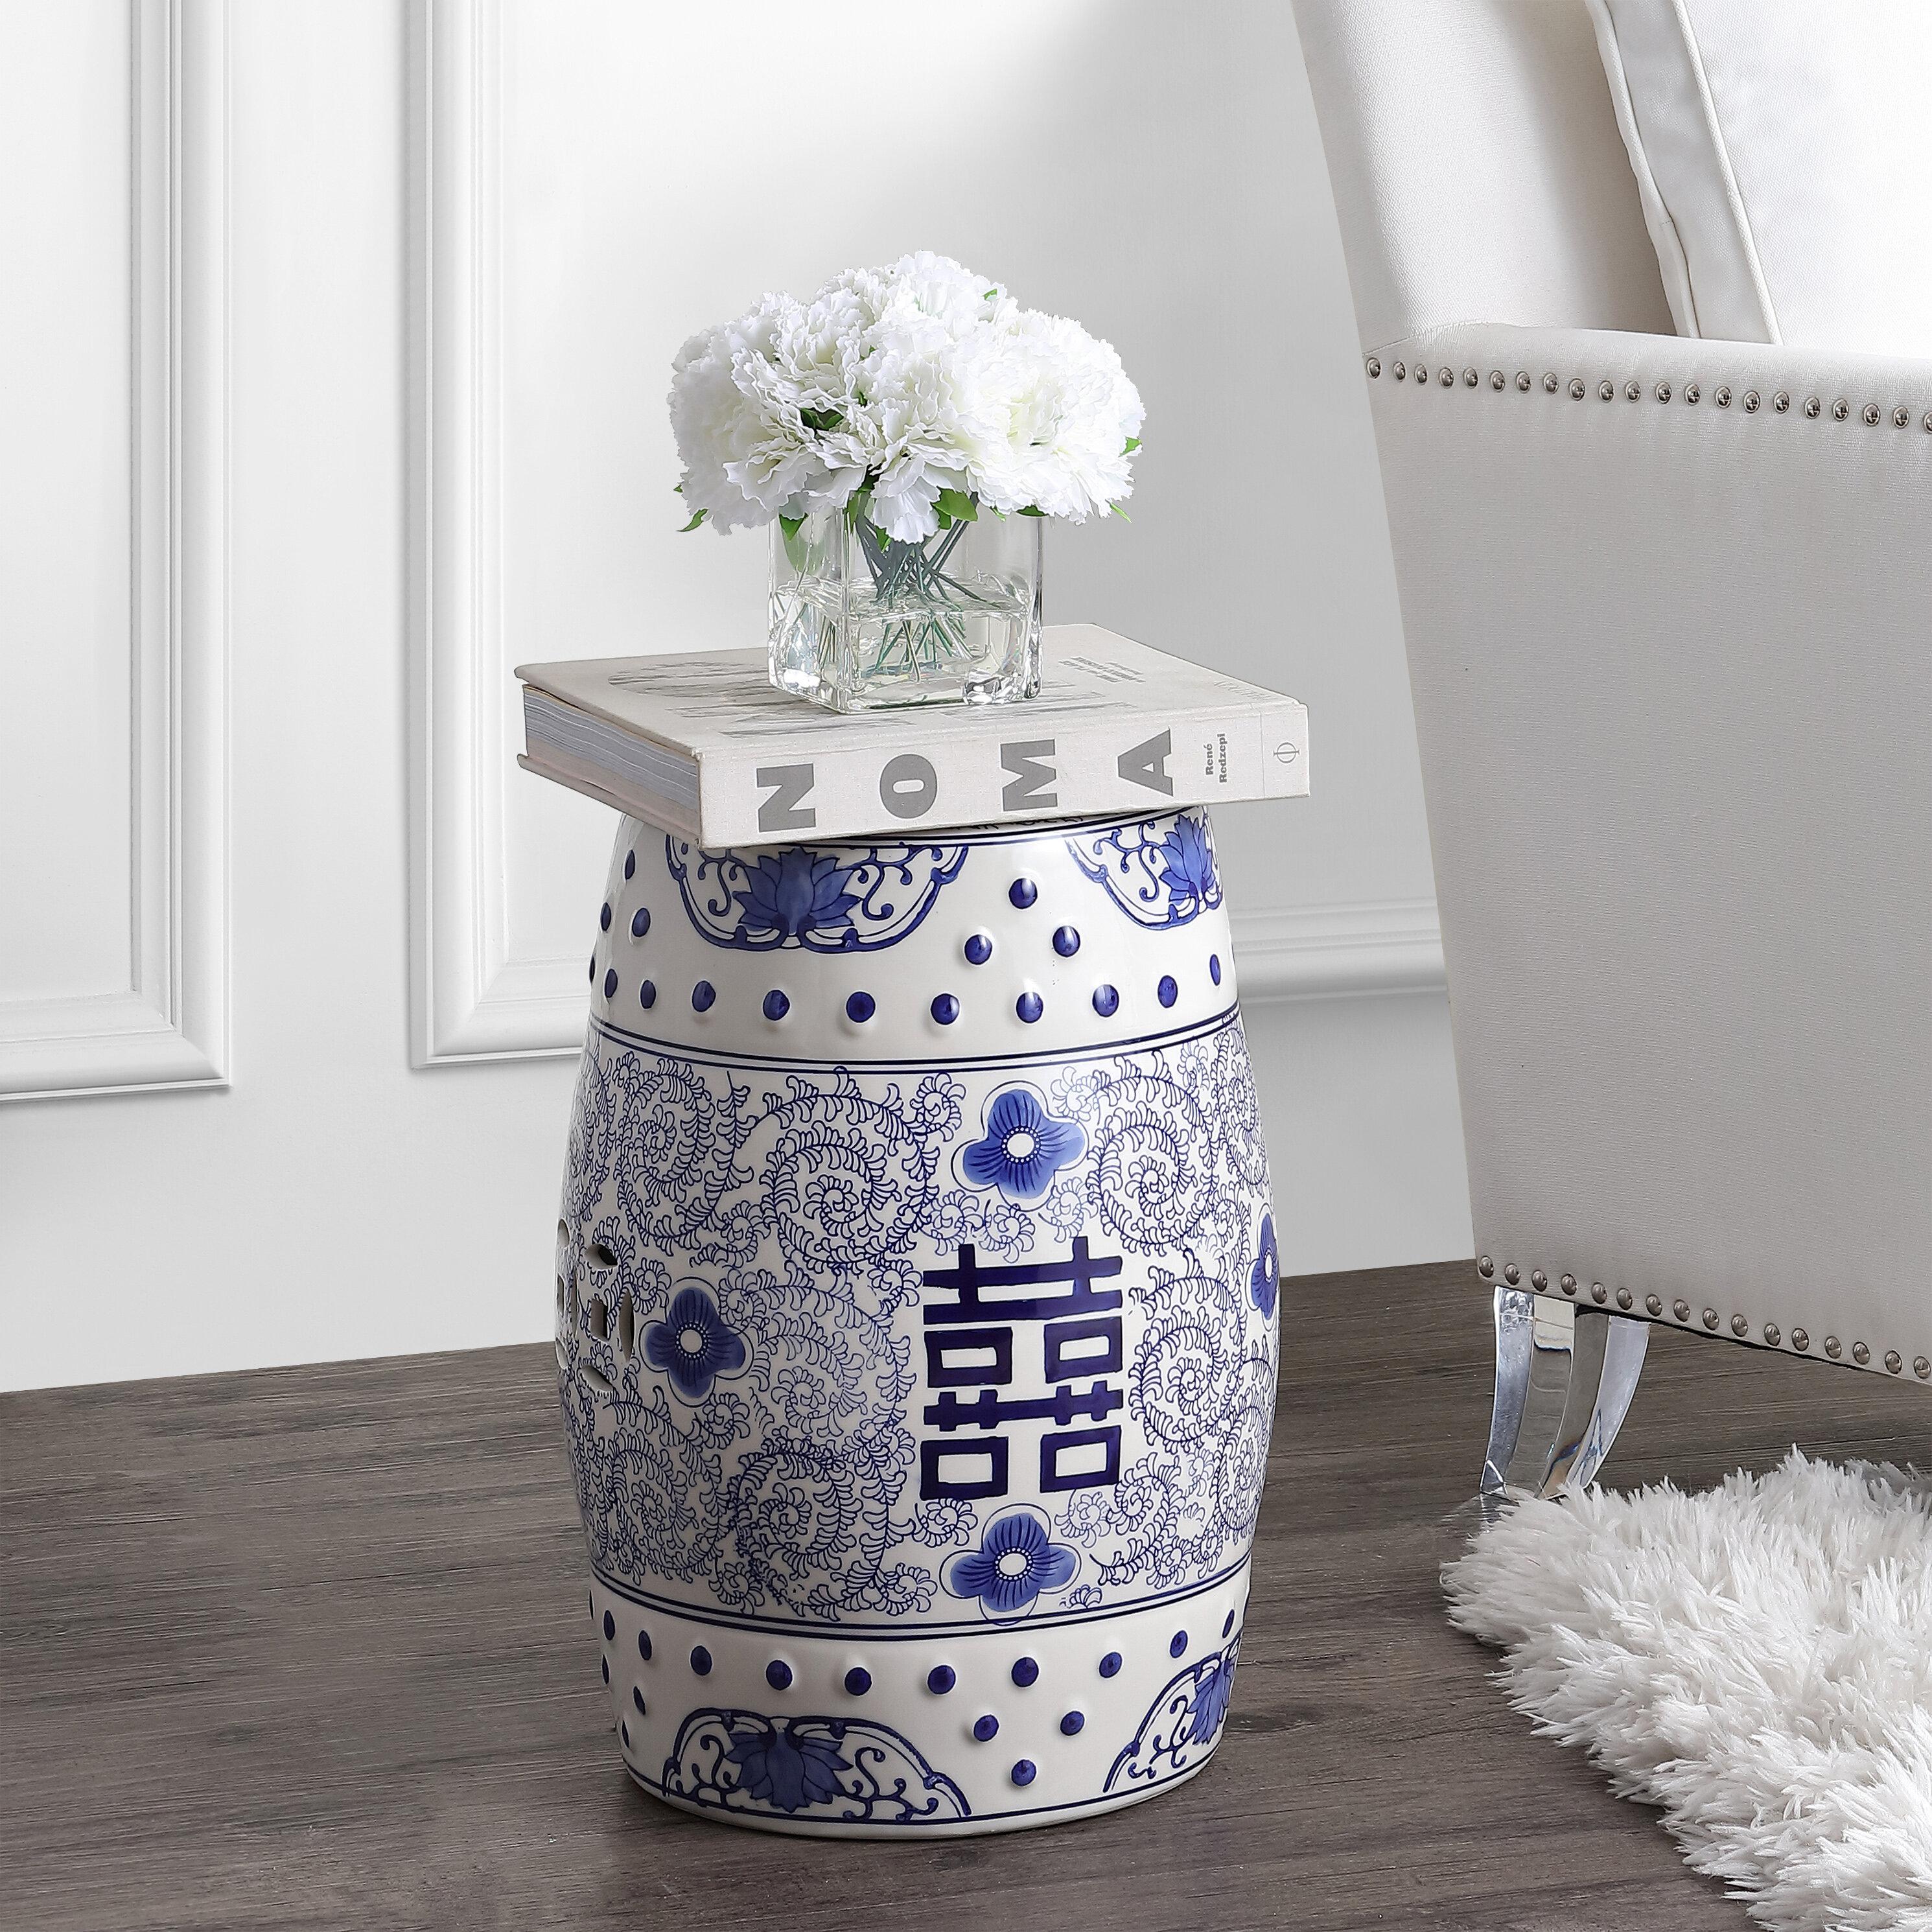 Phenomenal Galliher Double Happiness Chinoiserie Ceramic Garden Stool Creativecarmelina Interior Chair Design Creativecarmelinacom